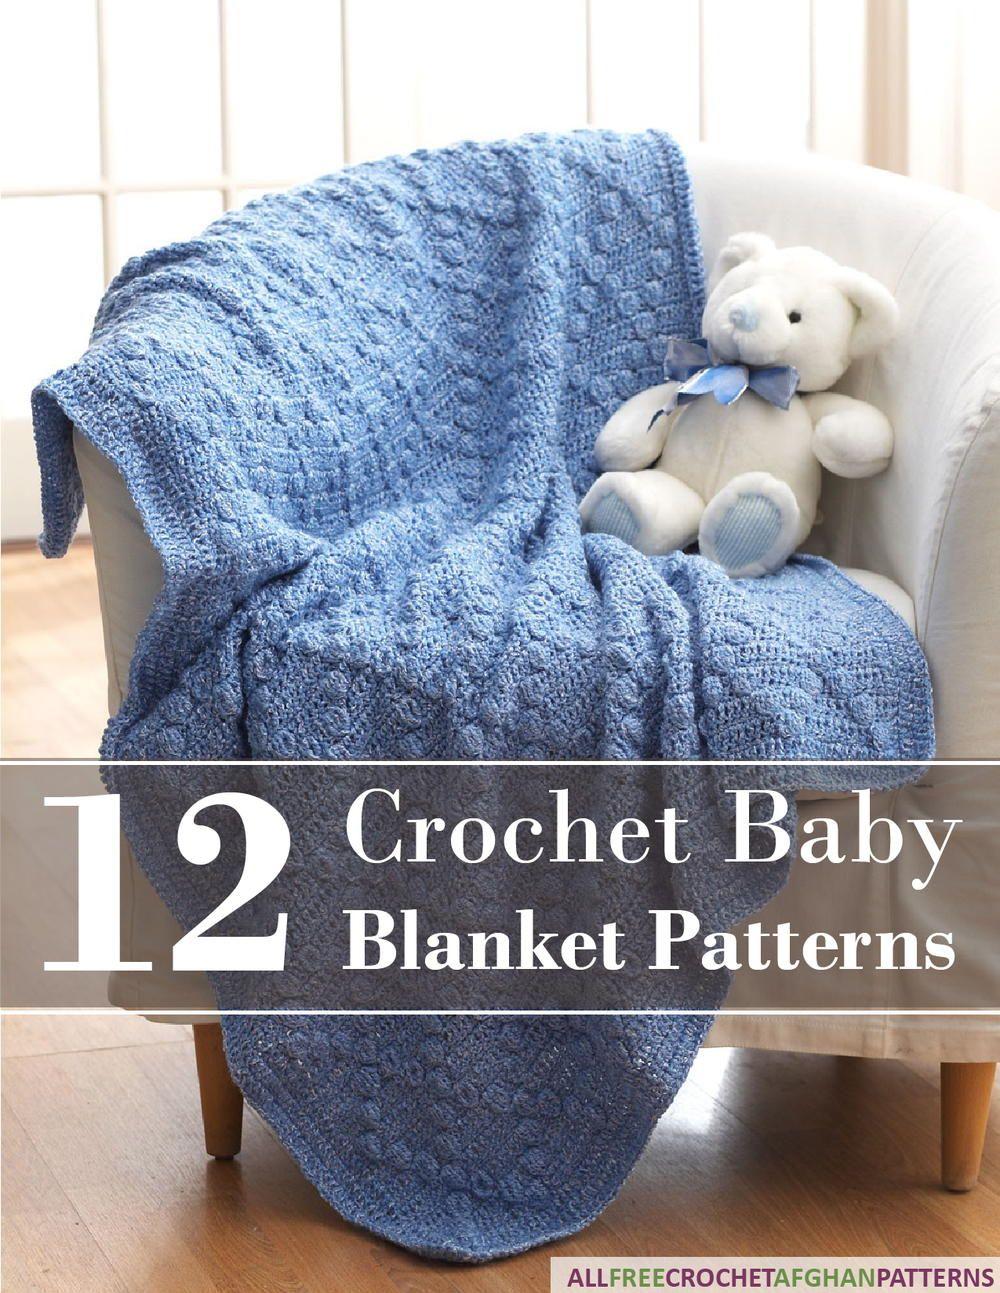 12 Crochet Baby Blanket Patterns free eBook   Crochet baby blankets ...